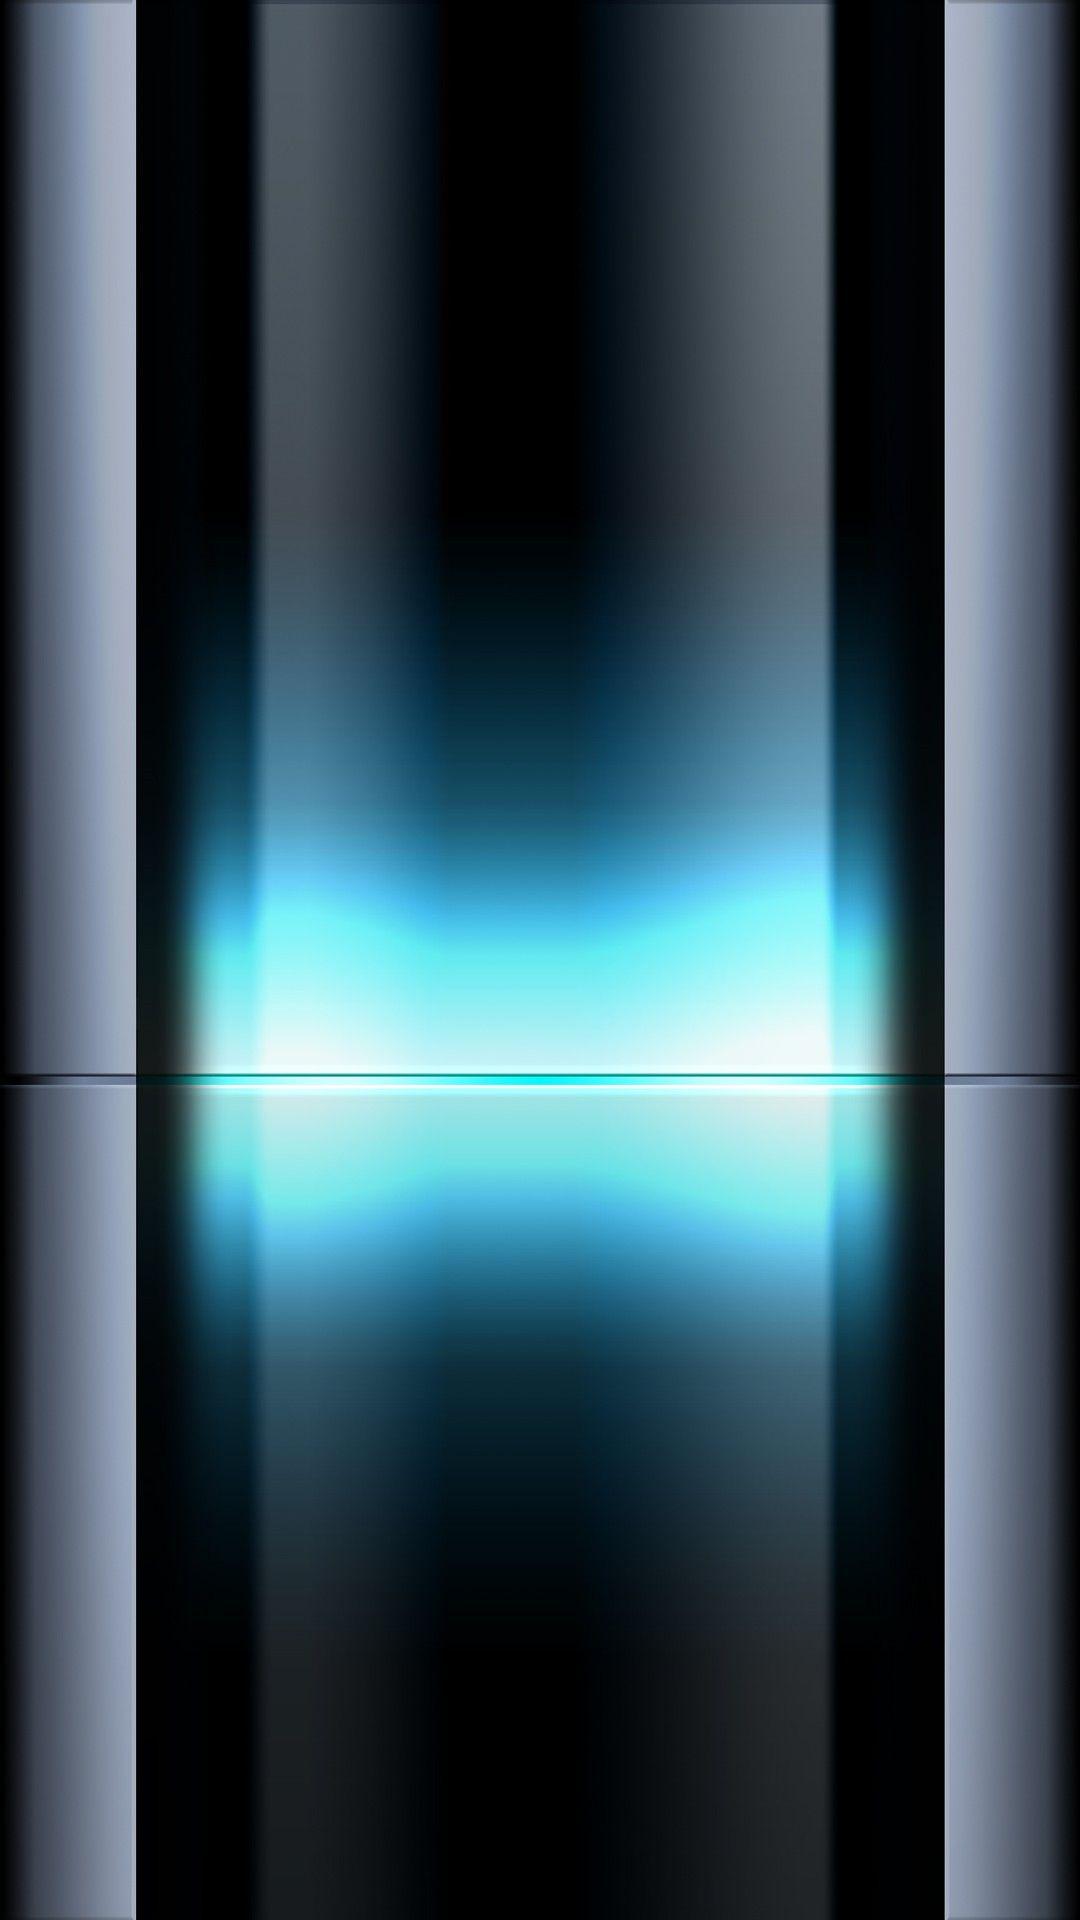 Pin By Moni On Samsung Galaxy S7 8 9 Edge Wallpaper In